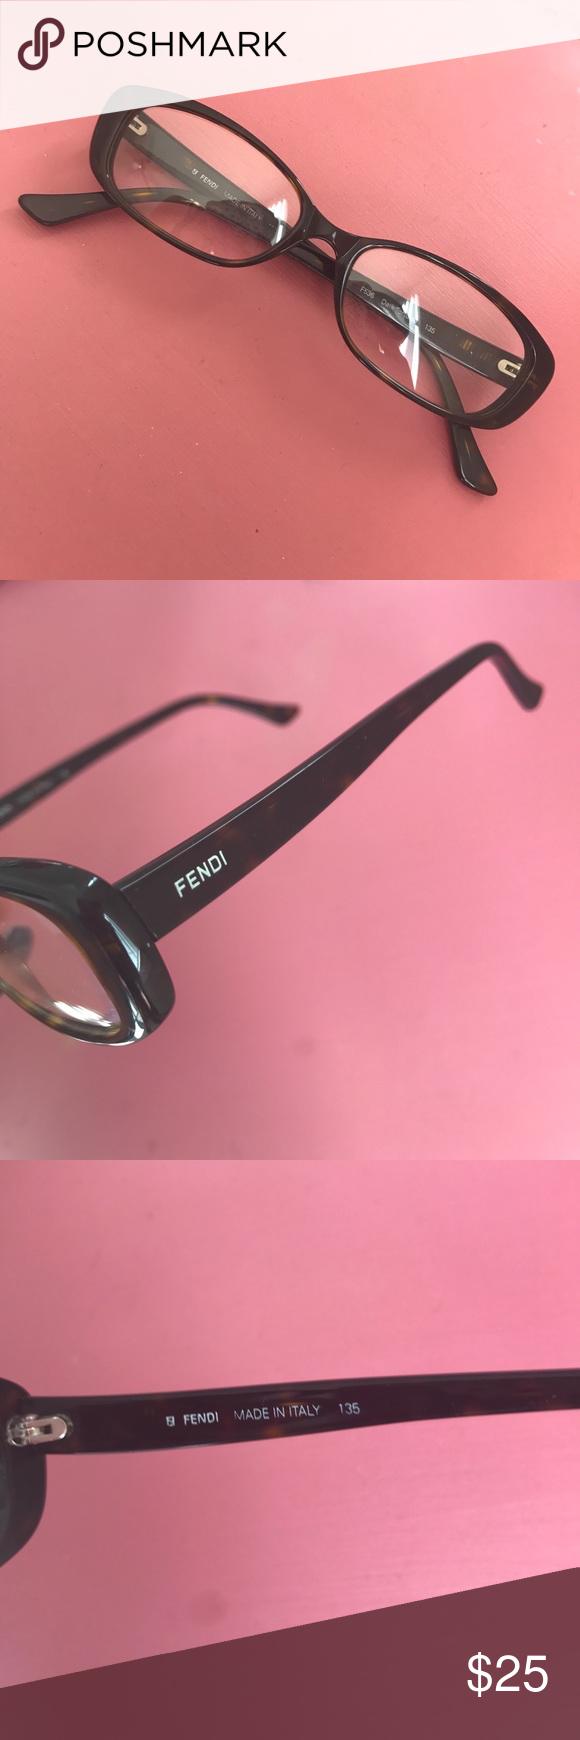 82bc163c7283 Fendi frames Prescription ready optical frames FENDI! Tortoise color  plastic frames. Fendi Accessories Glasses